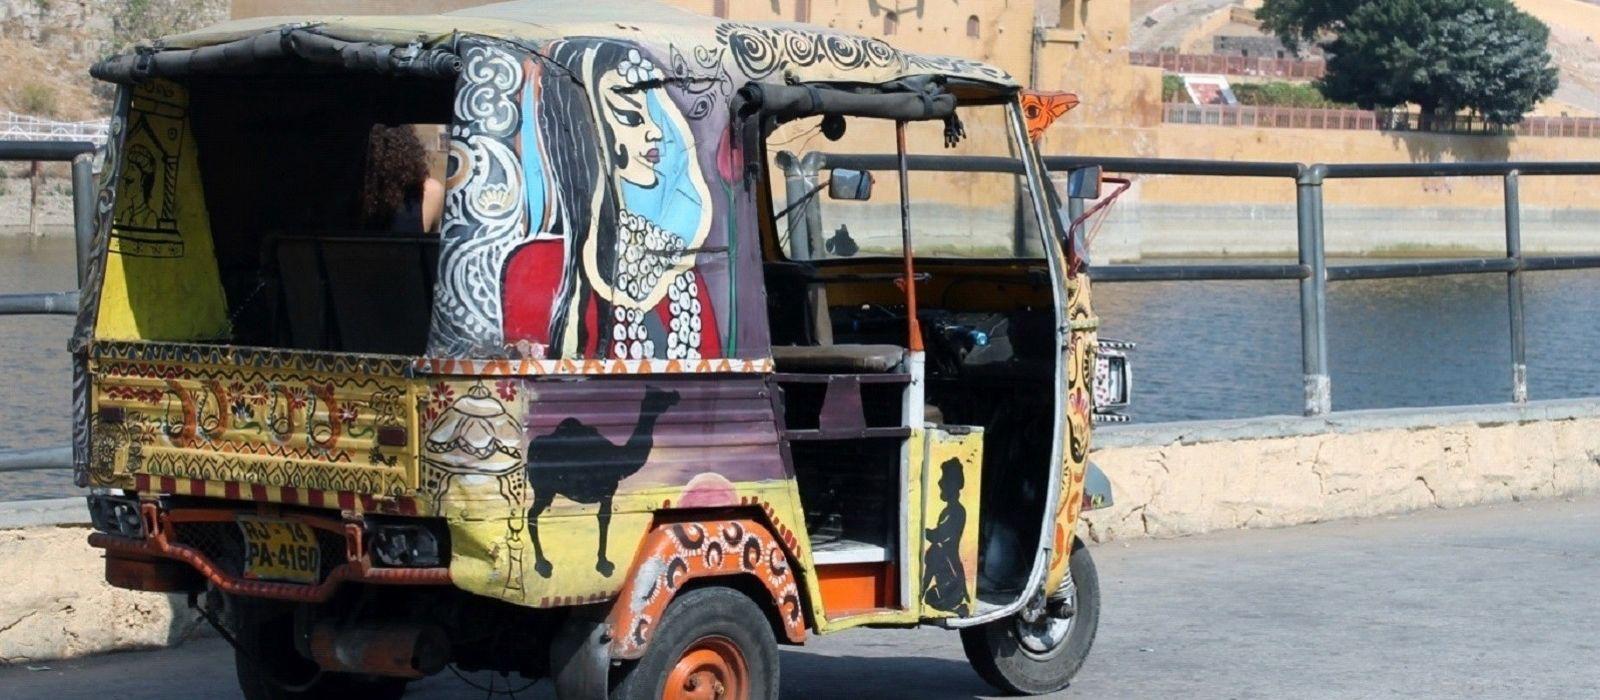 Private India tour: Chris and Deb's epic journeya tour!